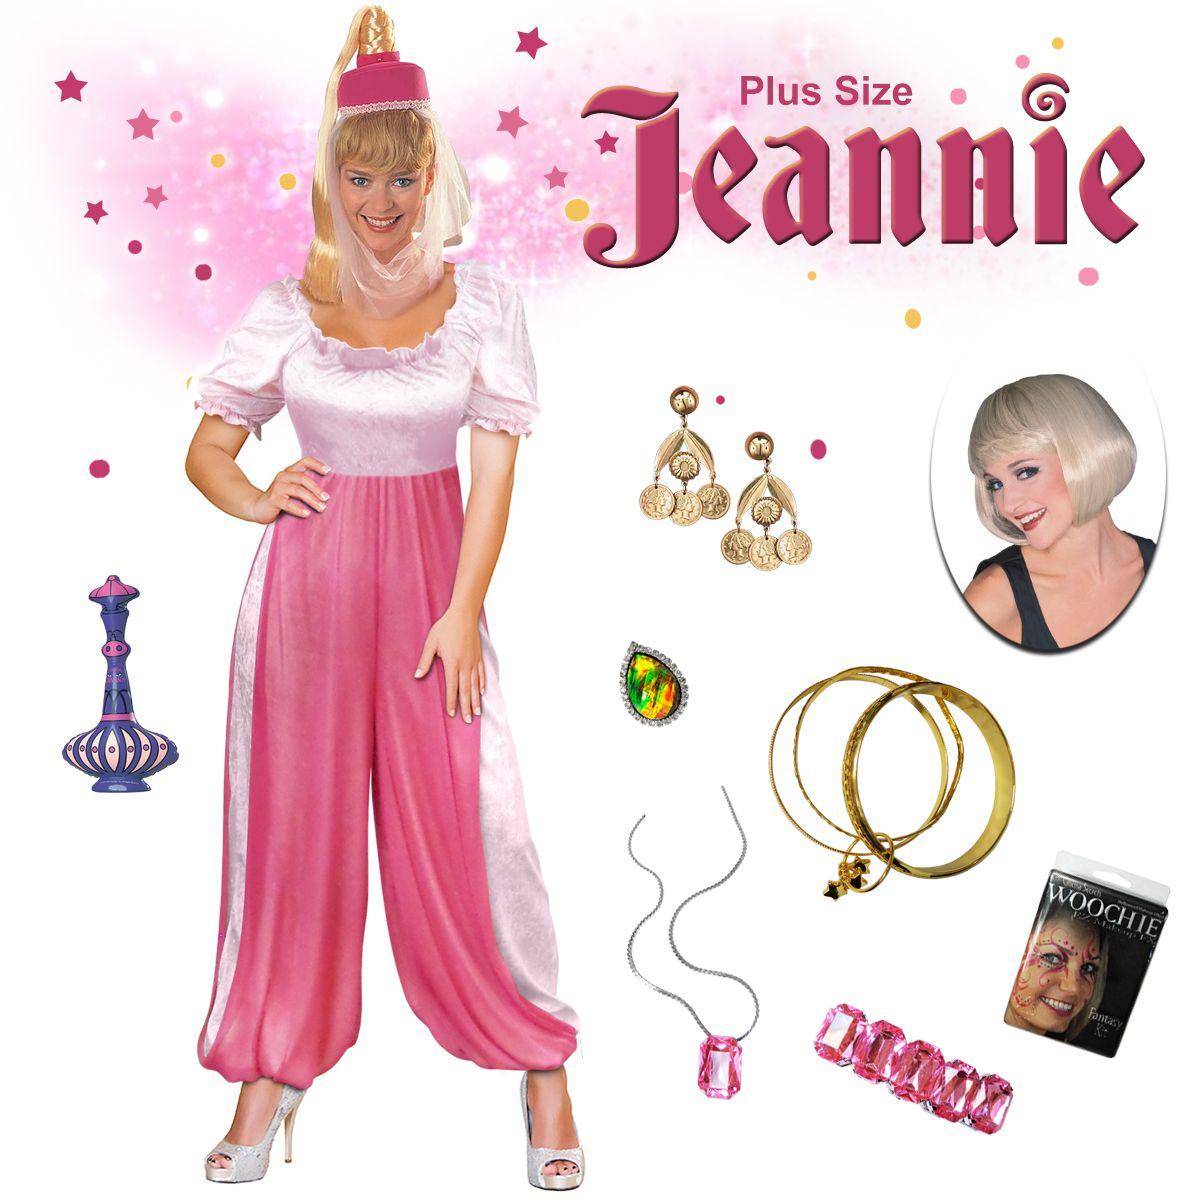 Jeannie the Genie Plus Size Supersize Halloween Costume Lg